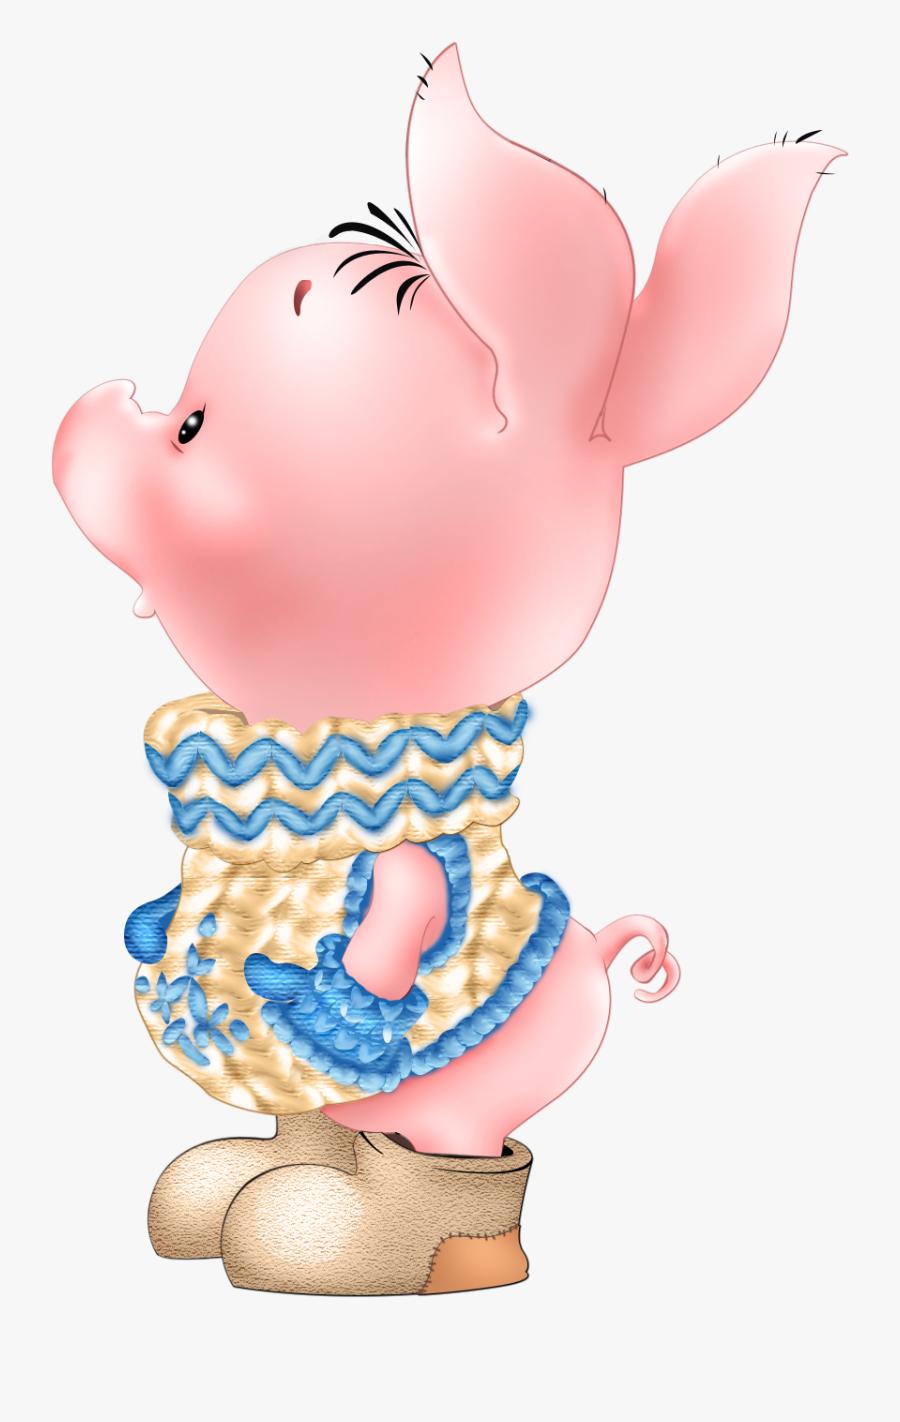 Cartoon Animals Clipart , Png Download - Cartoon Animals, Transparent Clipart